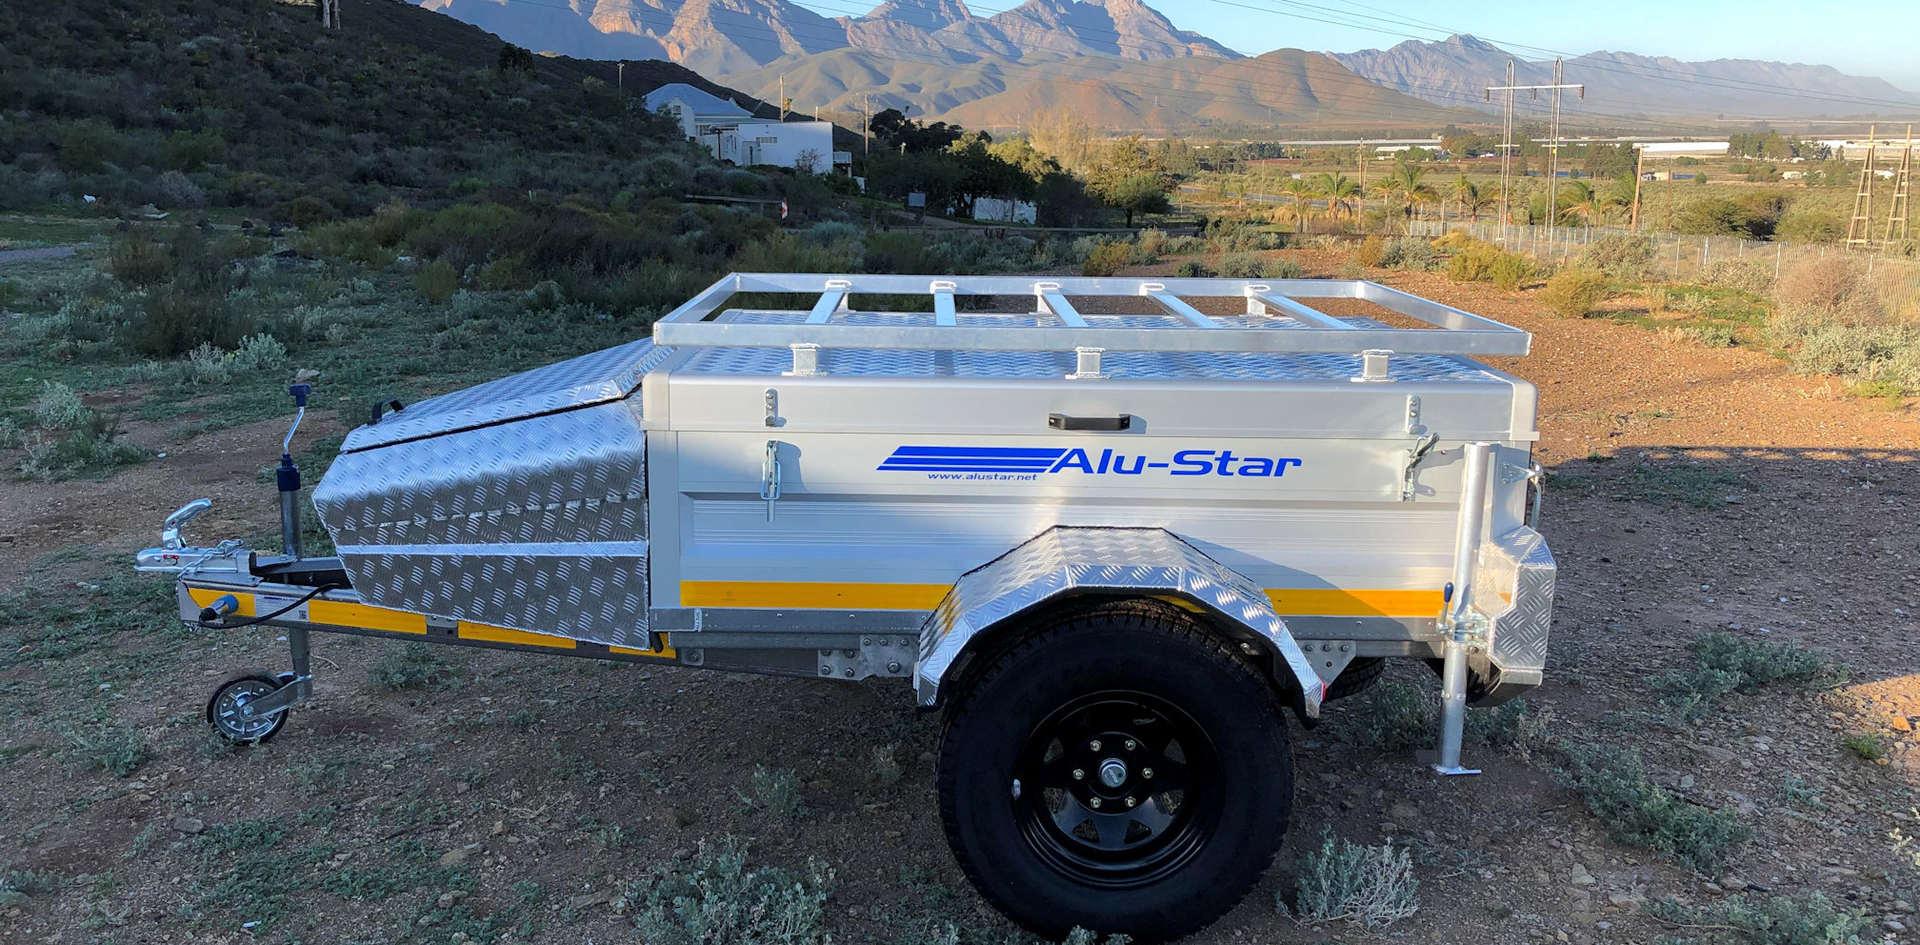 Alu-Star Shuttle